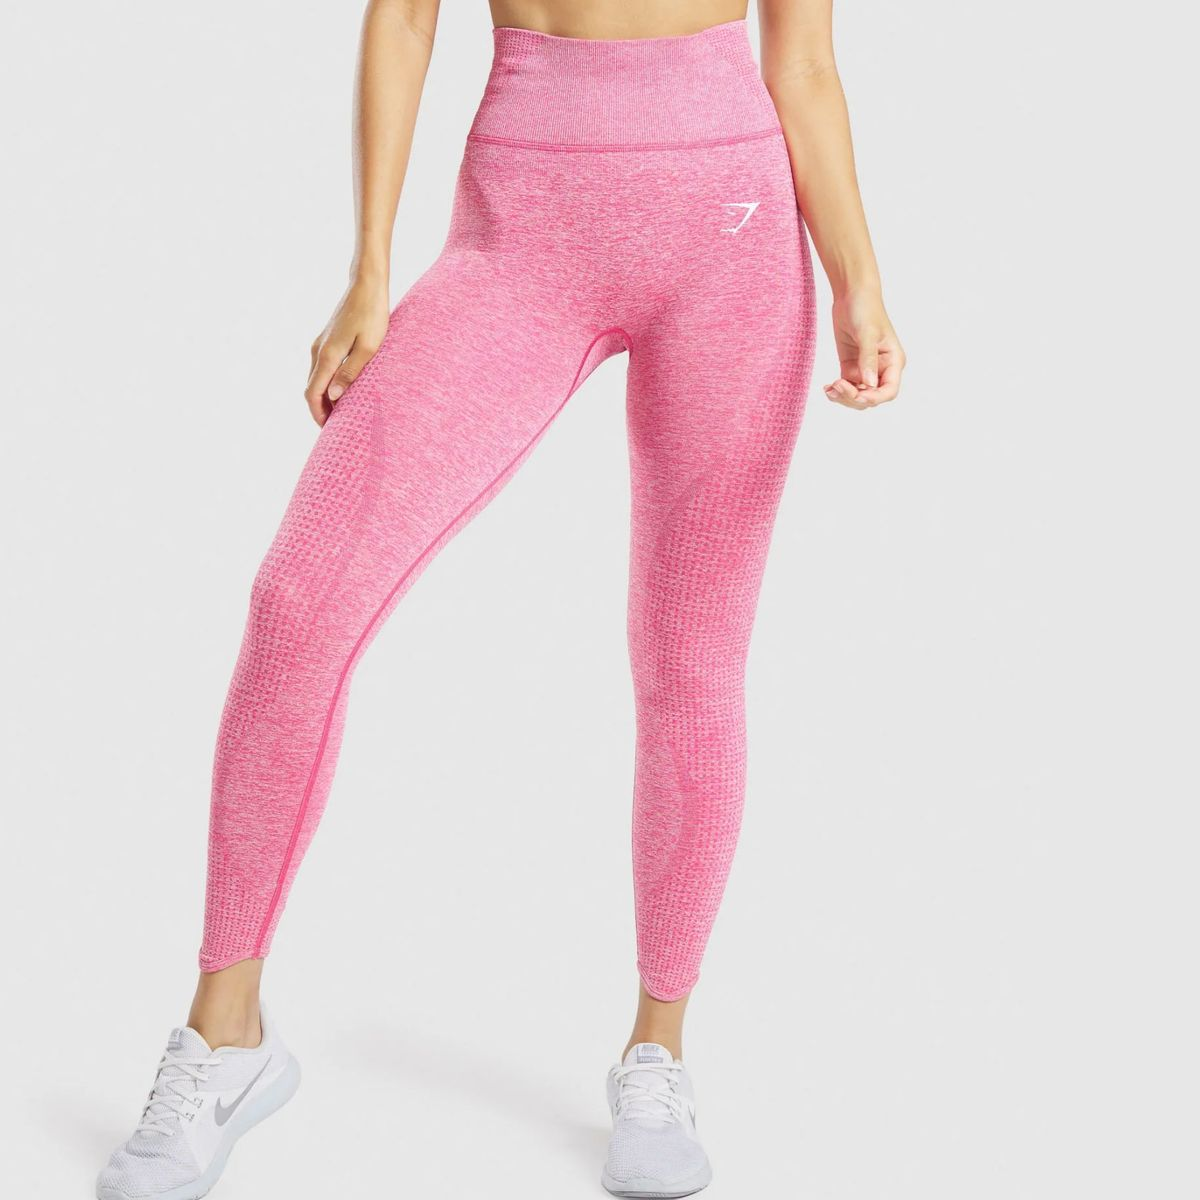 Sport Stretch Leggings White and Red  Heart Yoga Leggings,Capri Yoga Pants Mommy Me Leggings Fitness Workout Yoga Pants Joggers Active